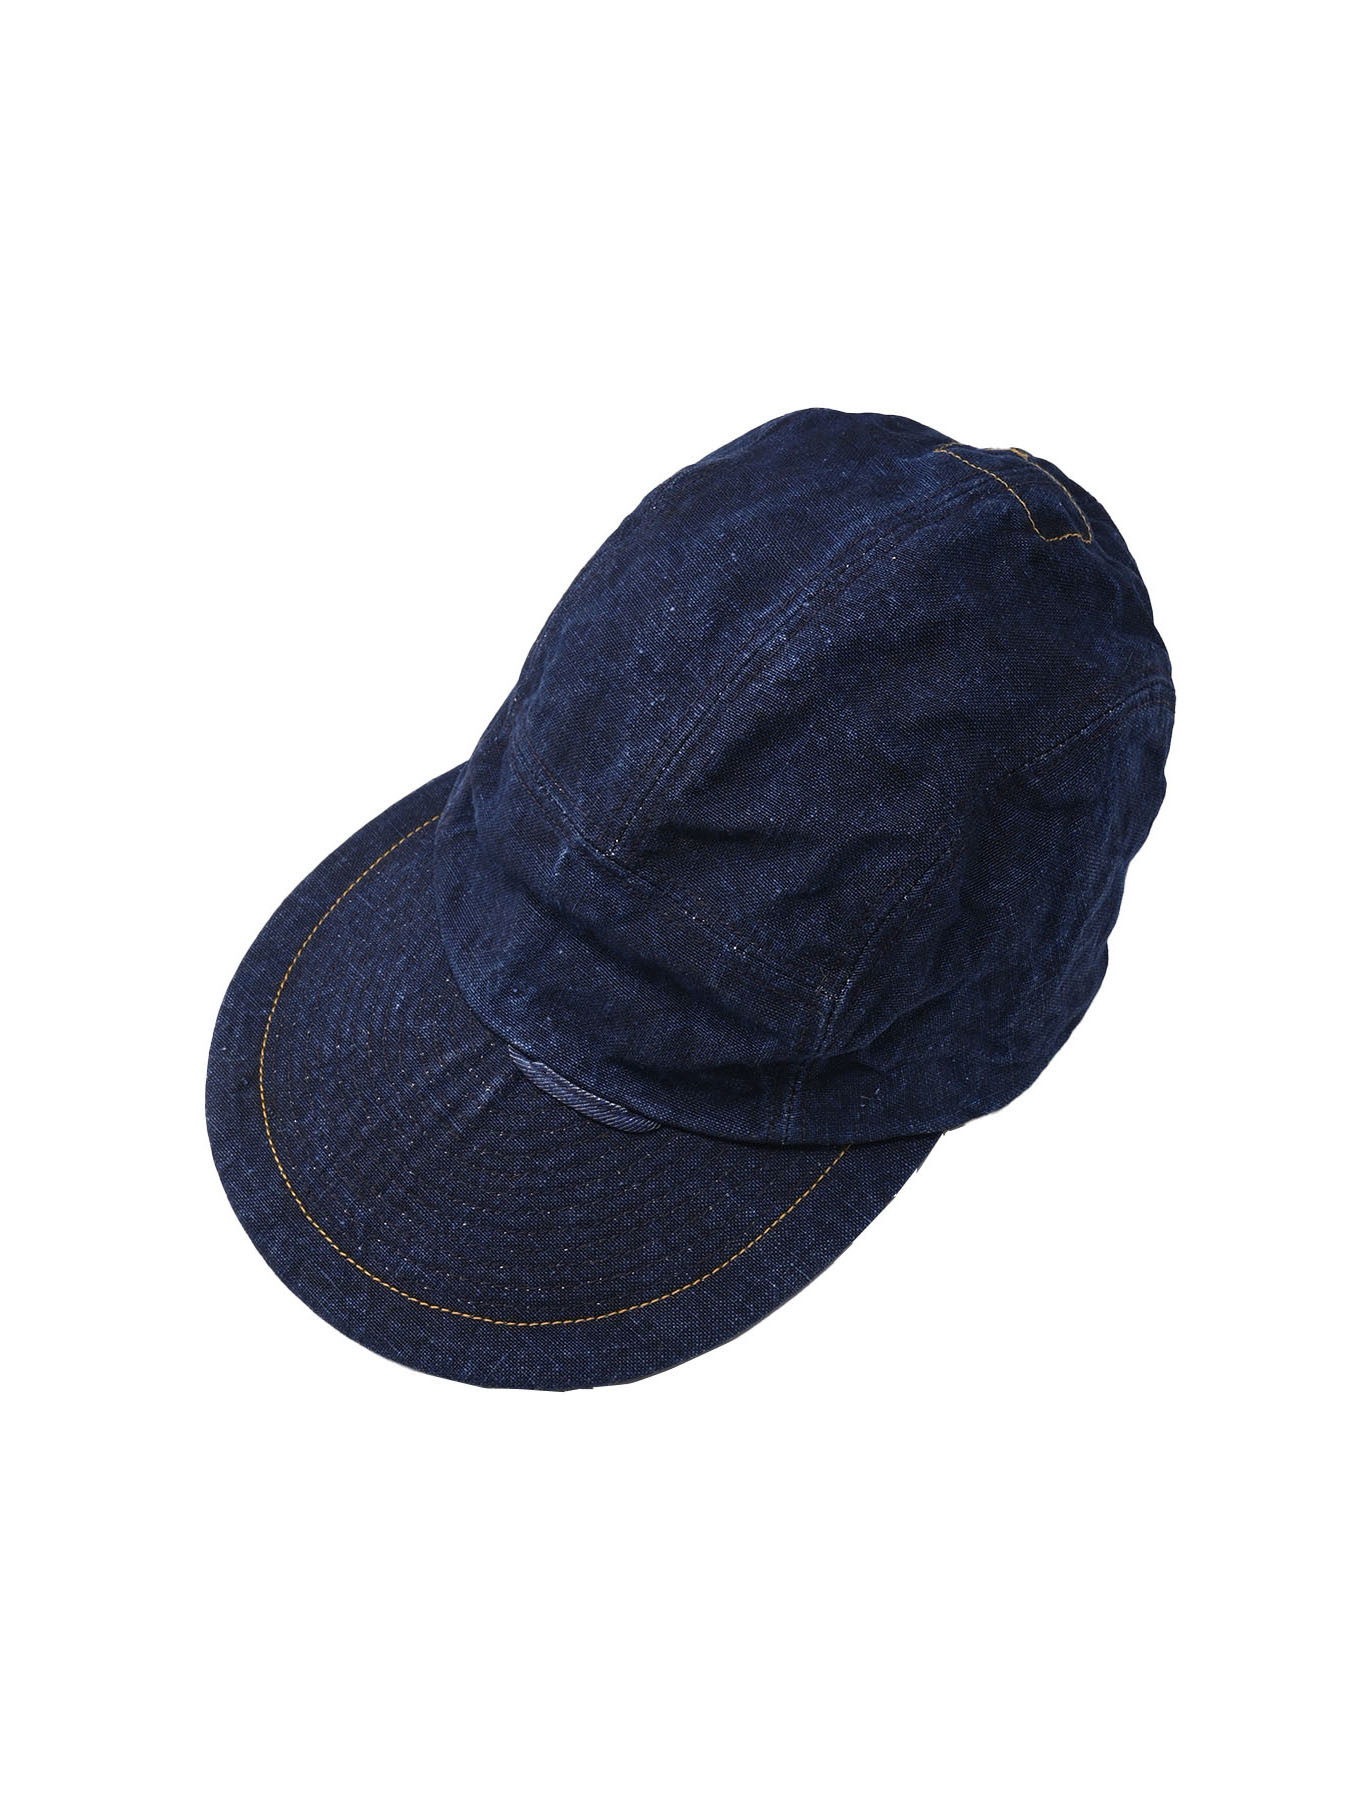 Indigo Linen Duck Cap (0421)-1